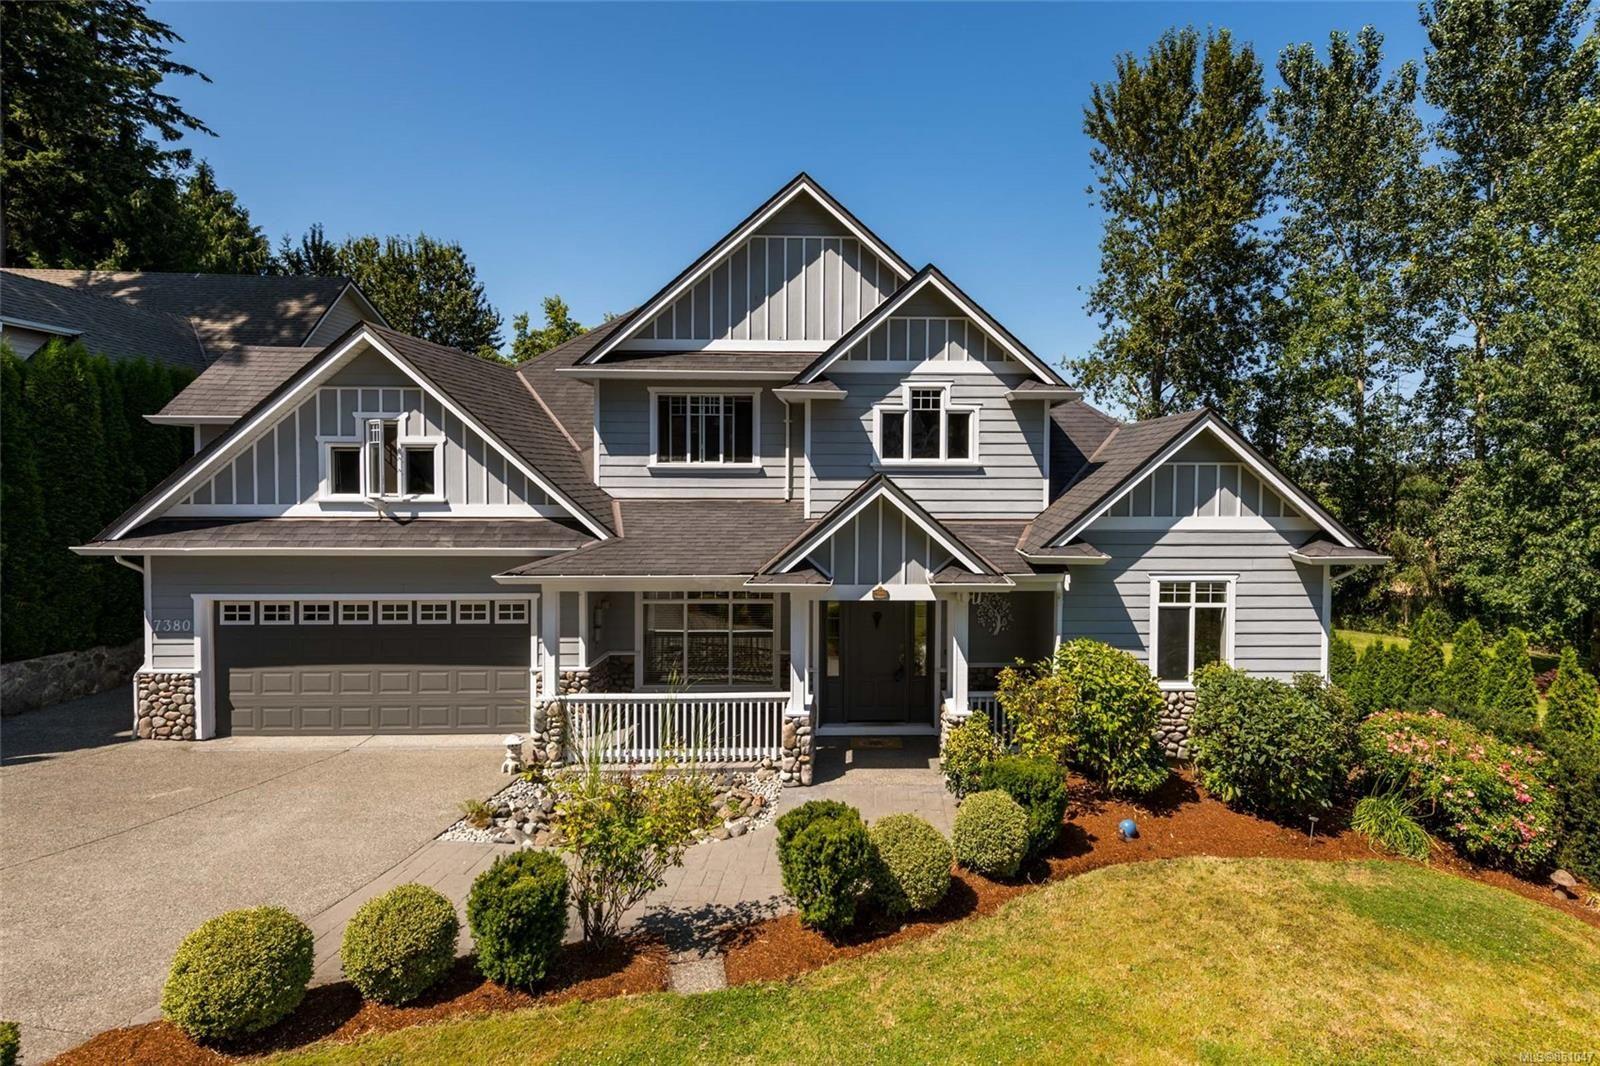 Main Photo: 7380 Ridgedown Crt in : CS Saanichton House for sale (Central Saanich)  : MLS®# 851047